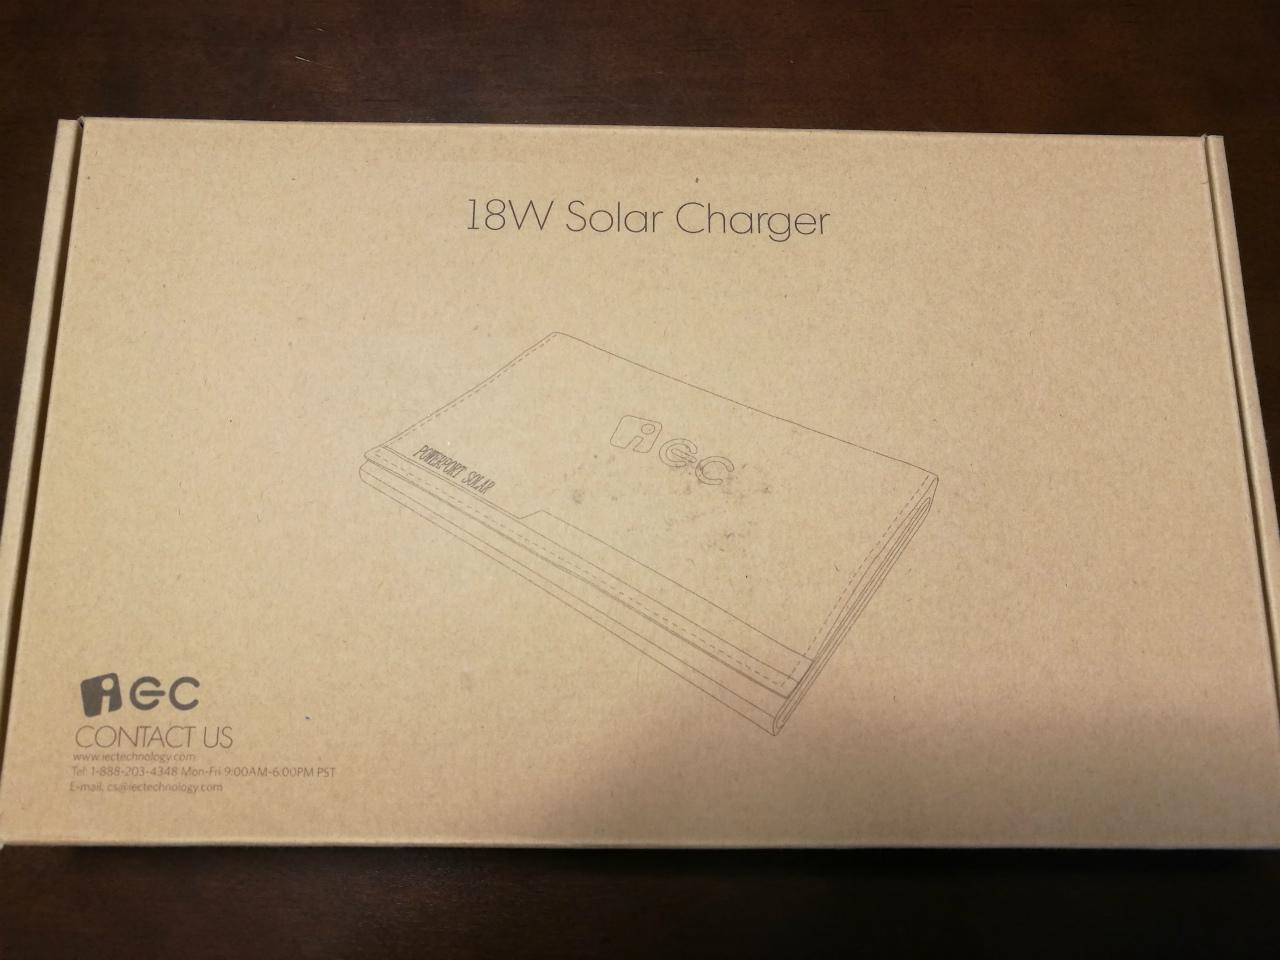 pr-ec-technology-18w-solar-charger-01